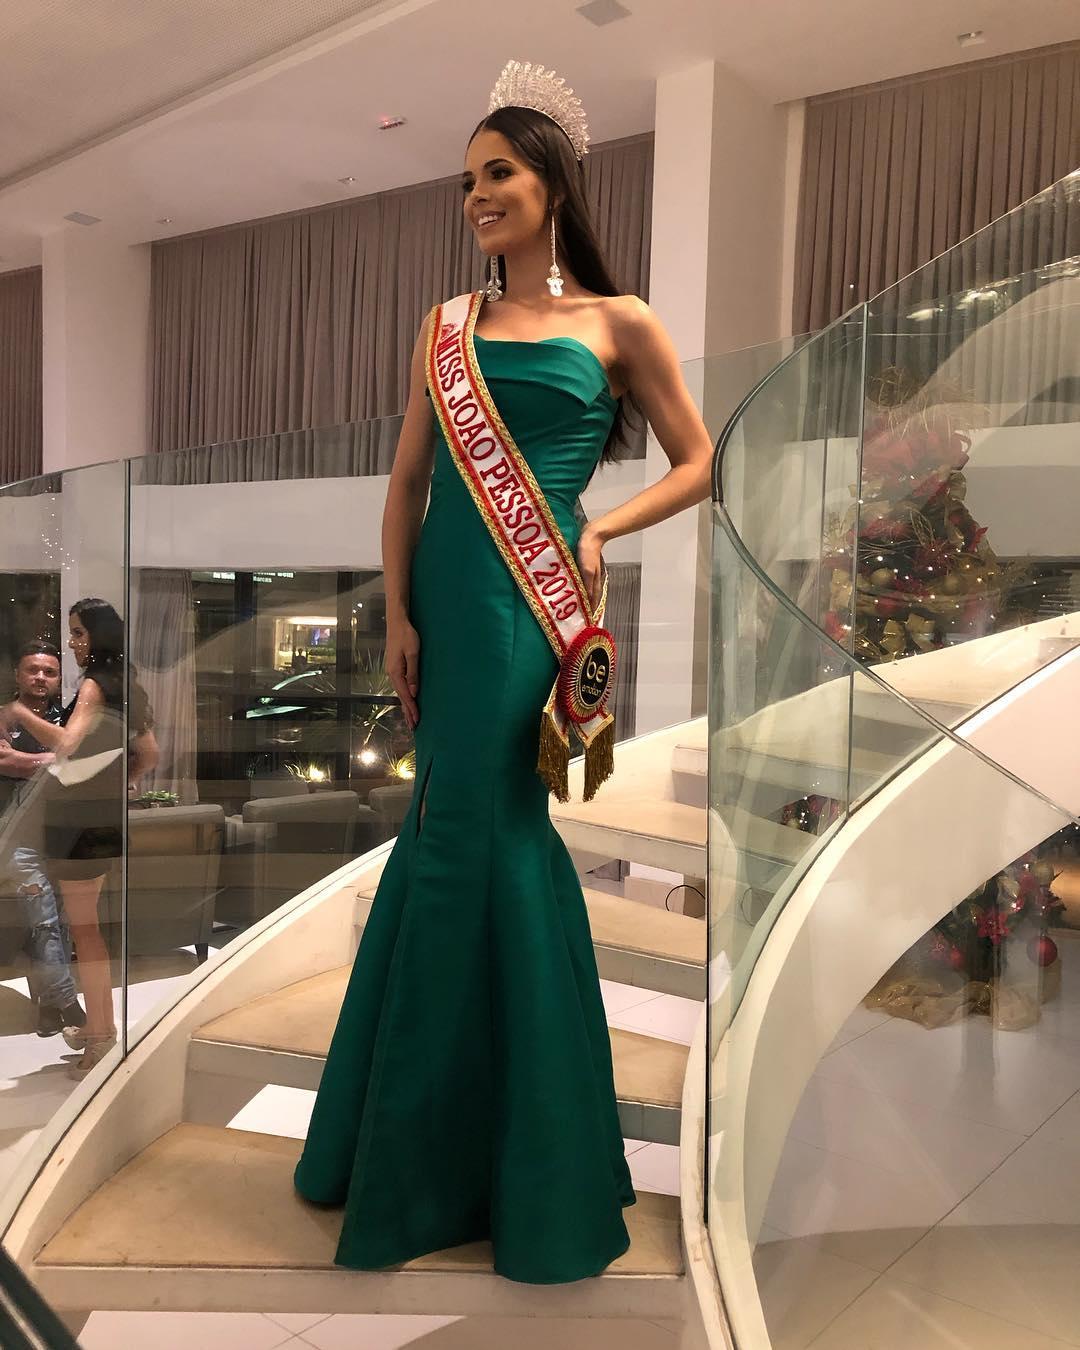 kennya araujo, miss paraiba 2019. - Página 2 46969610